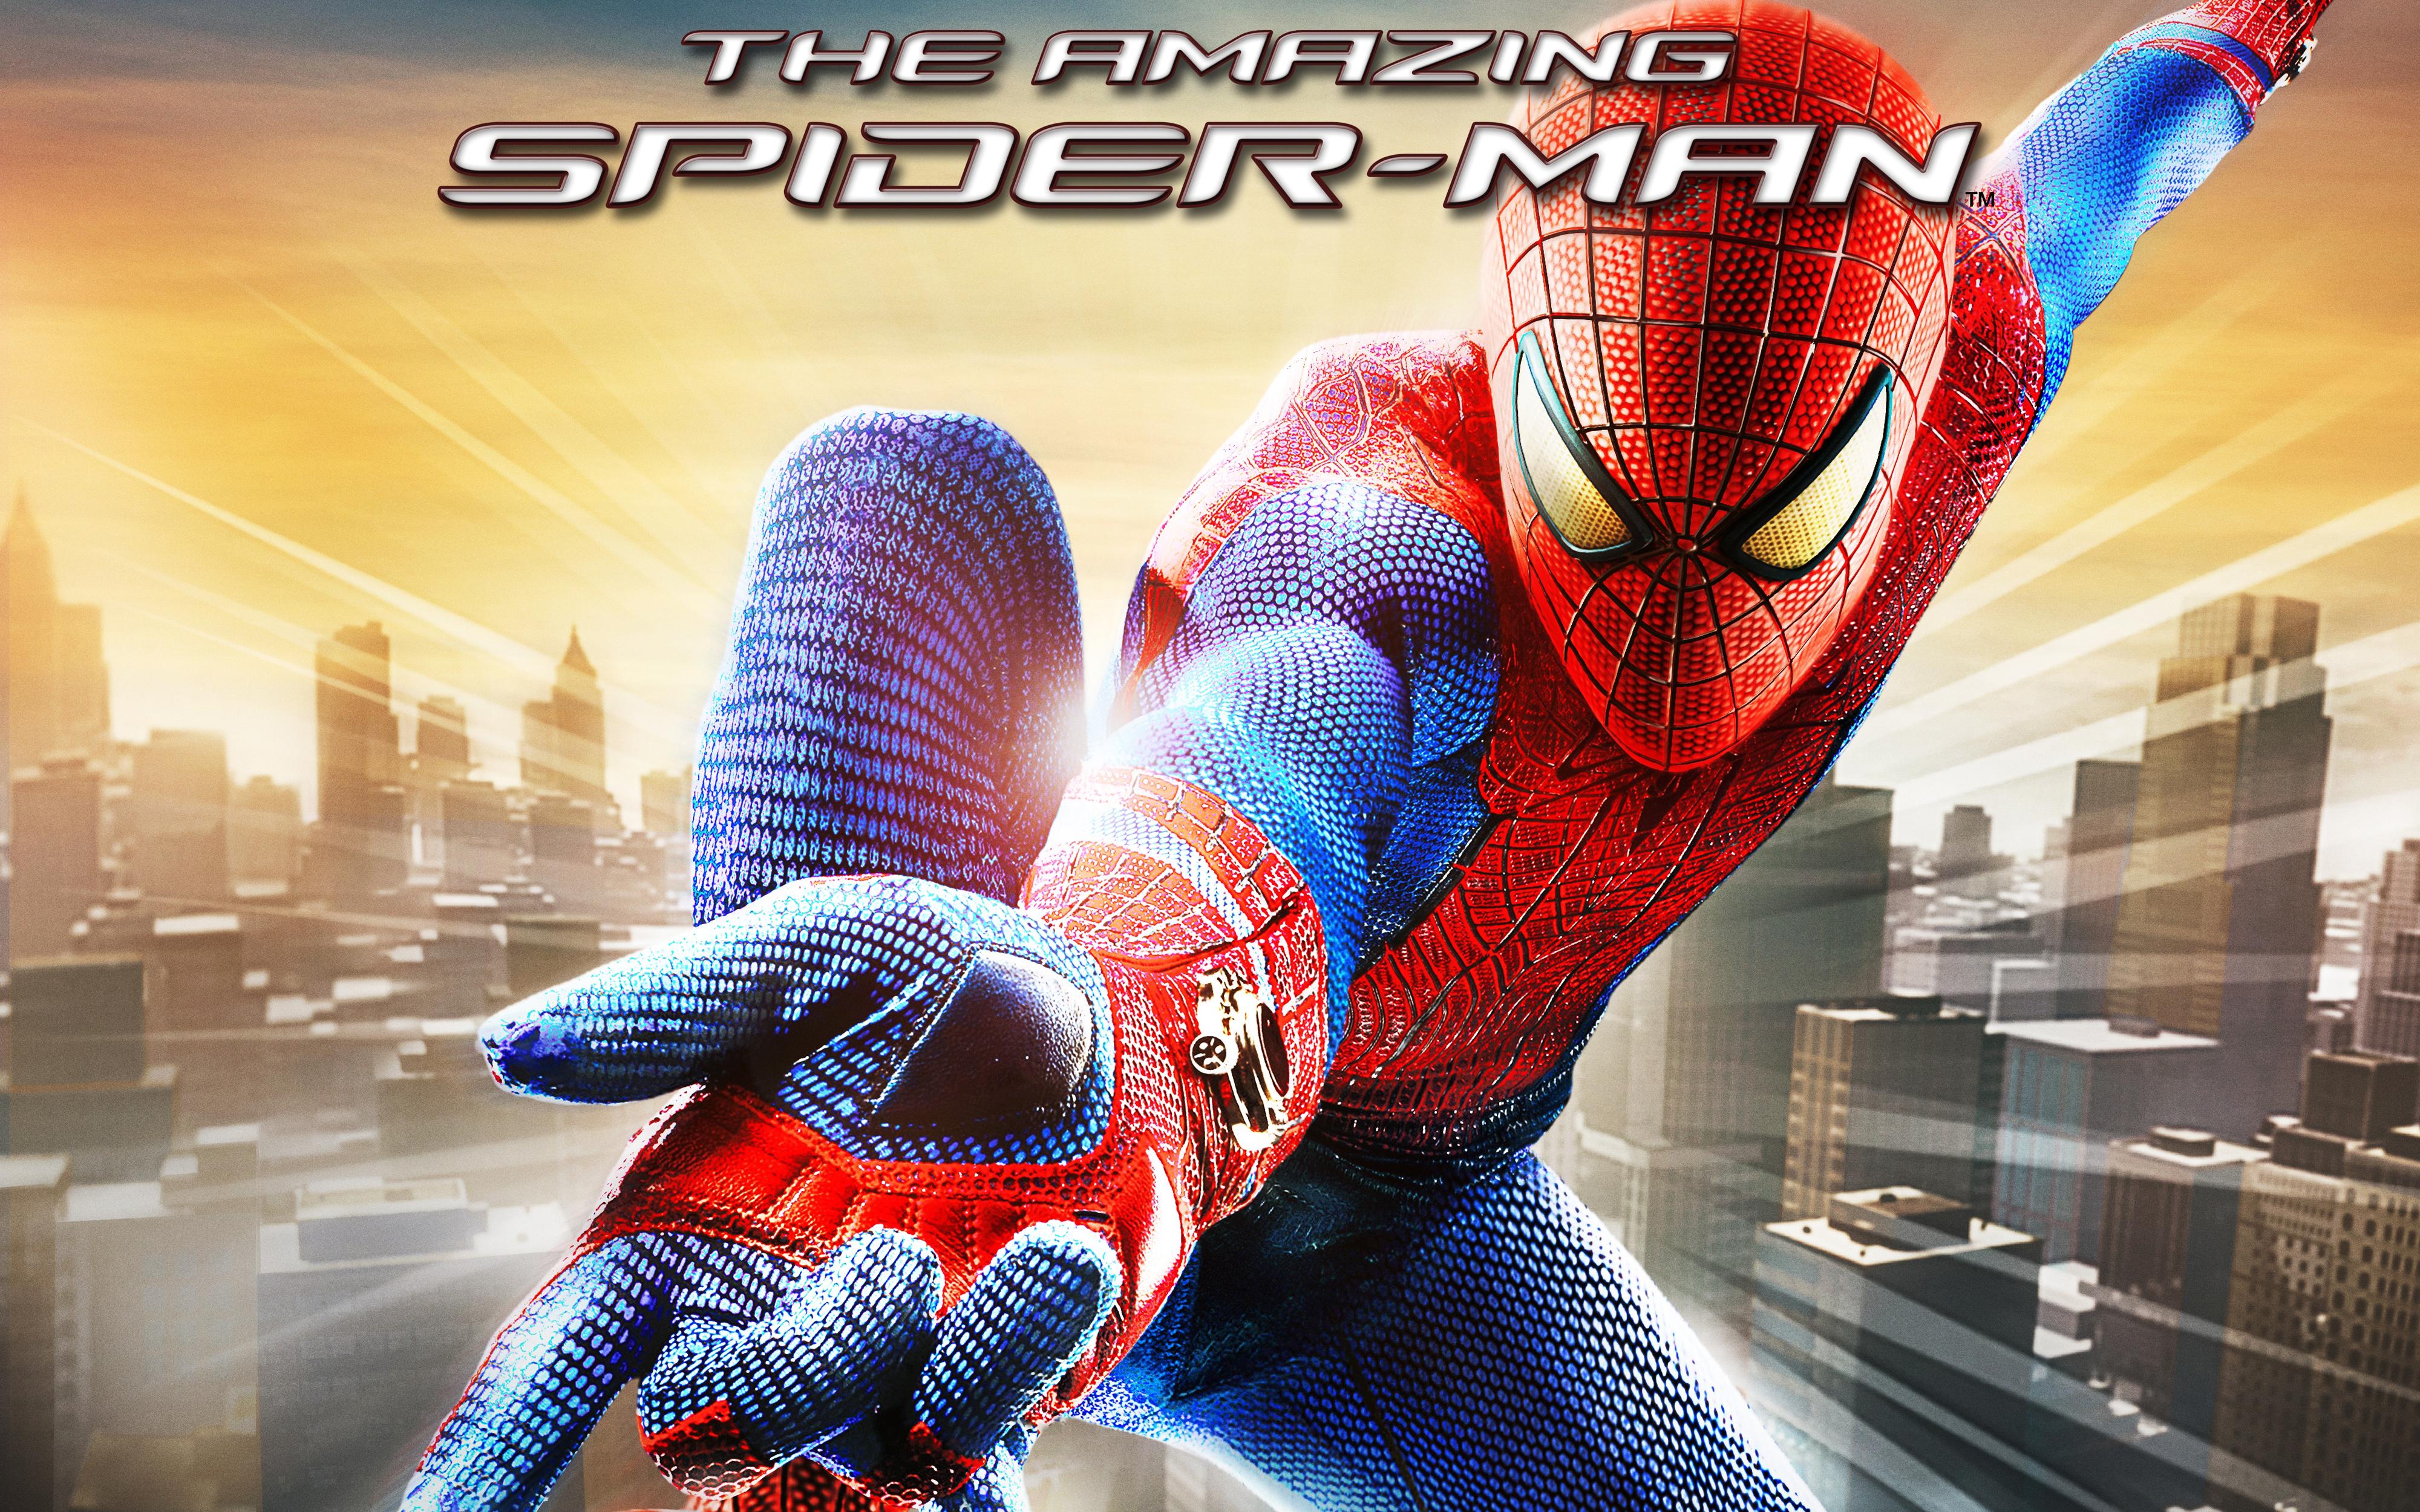 The Amazing Spider-man Hd Wallpaper Hd - Amazing Spider Man Game - HD Wallpaper